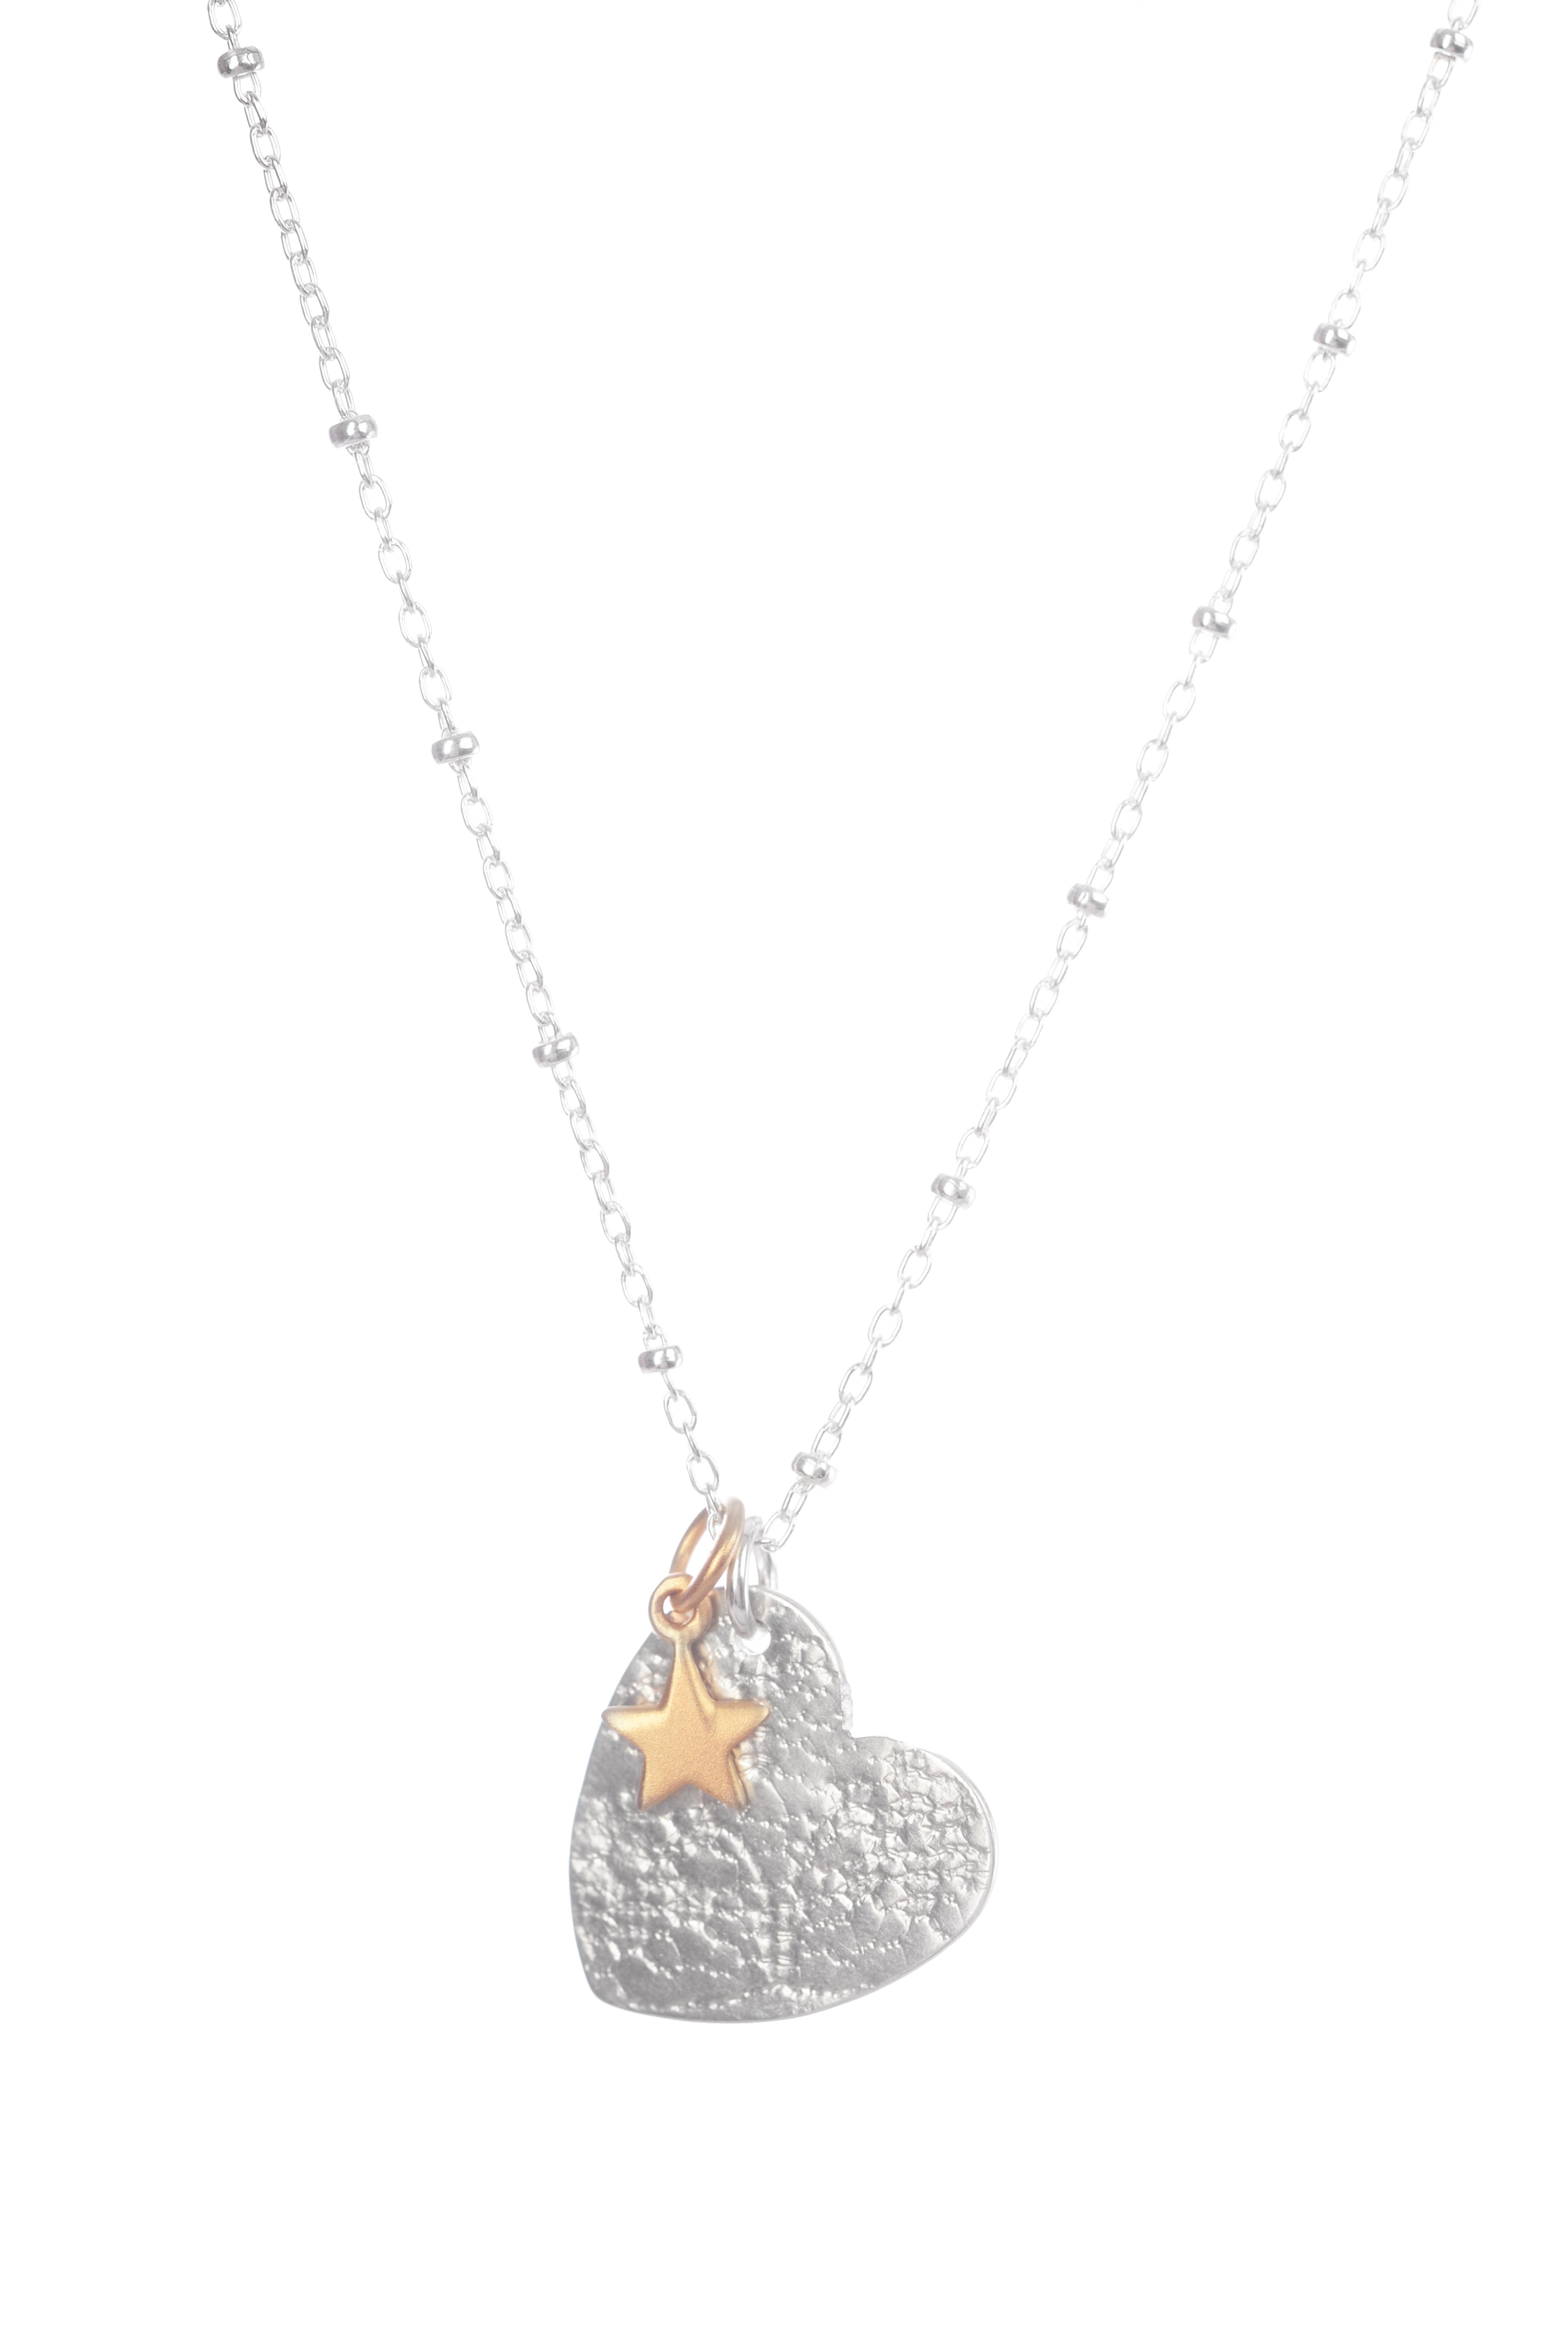 Godmother necklace fine artisan jewelry by erin pelica godmother necklace aloadofball Gallery